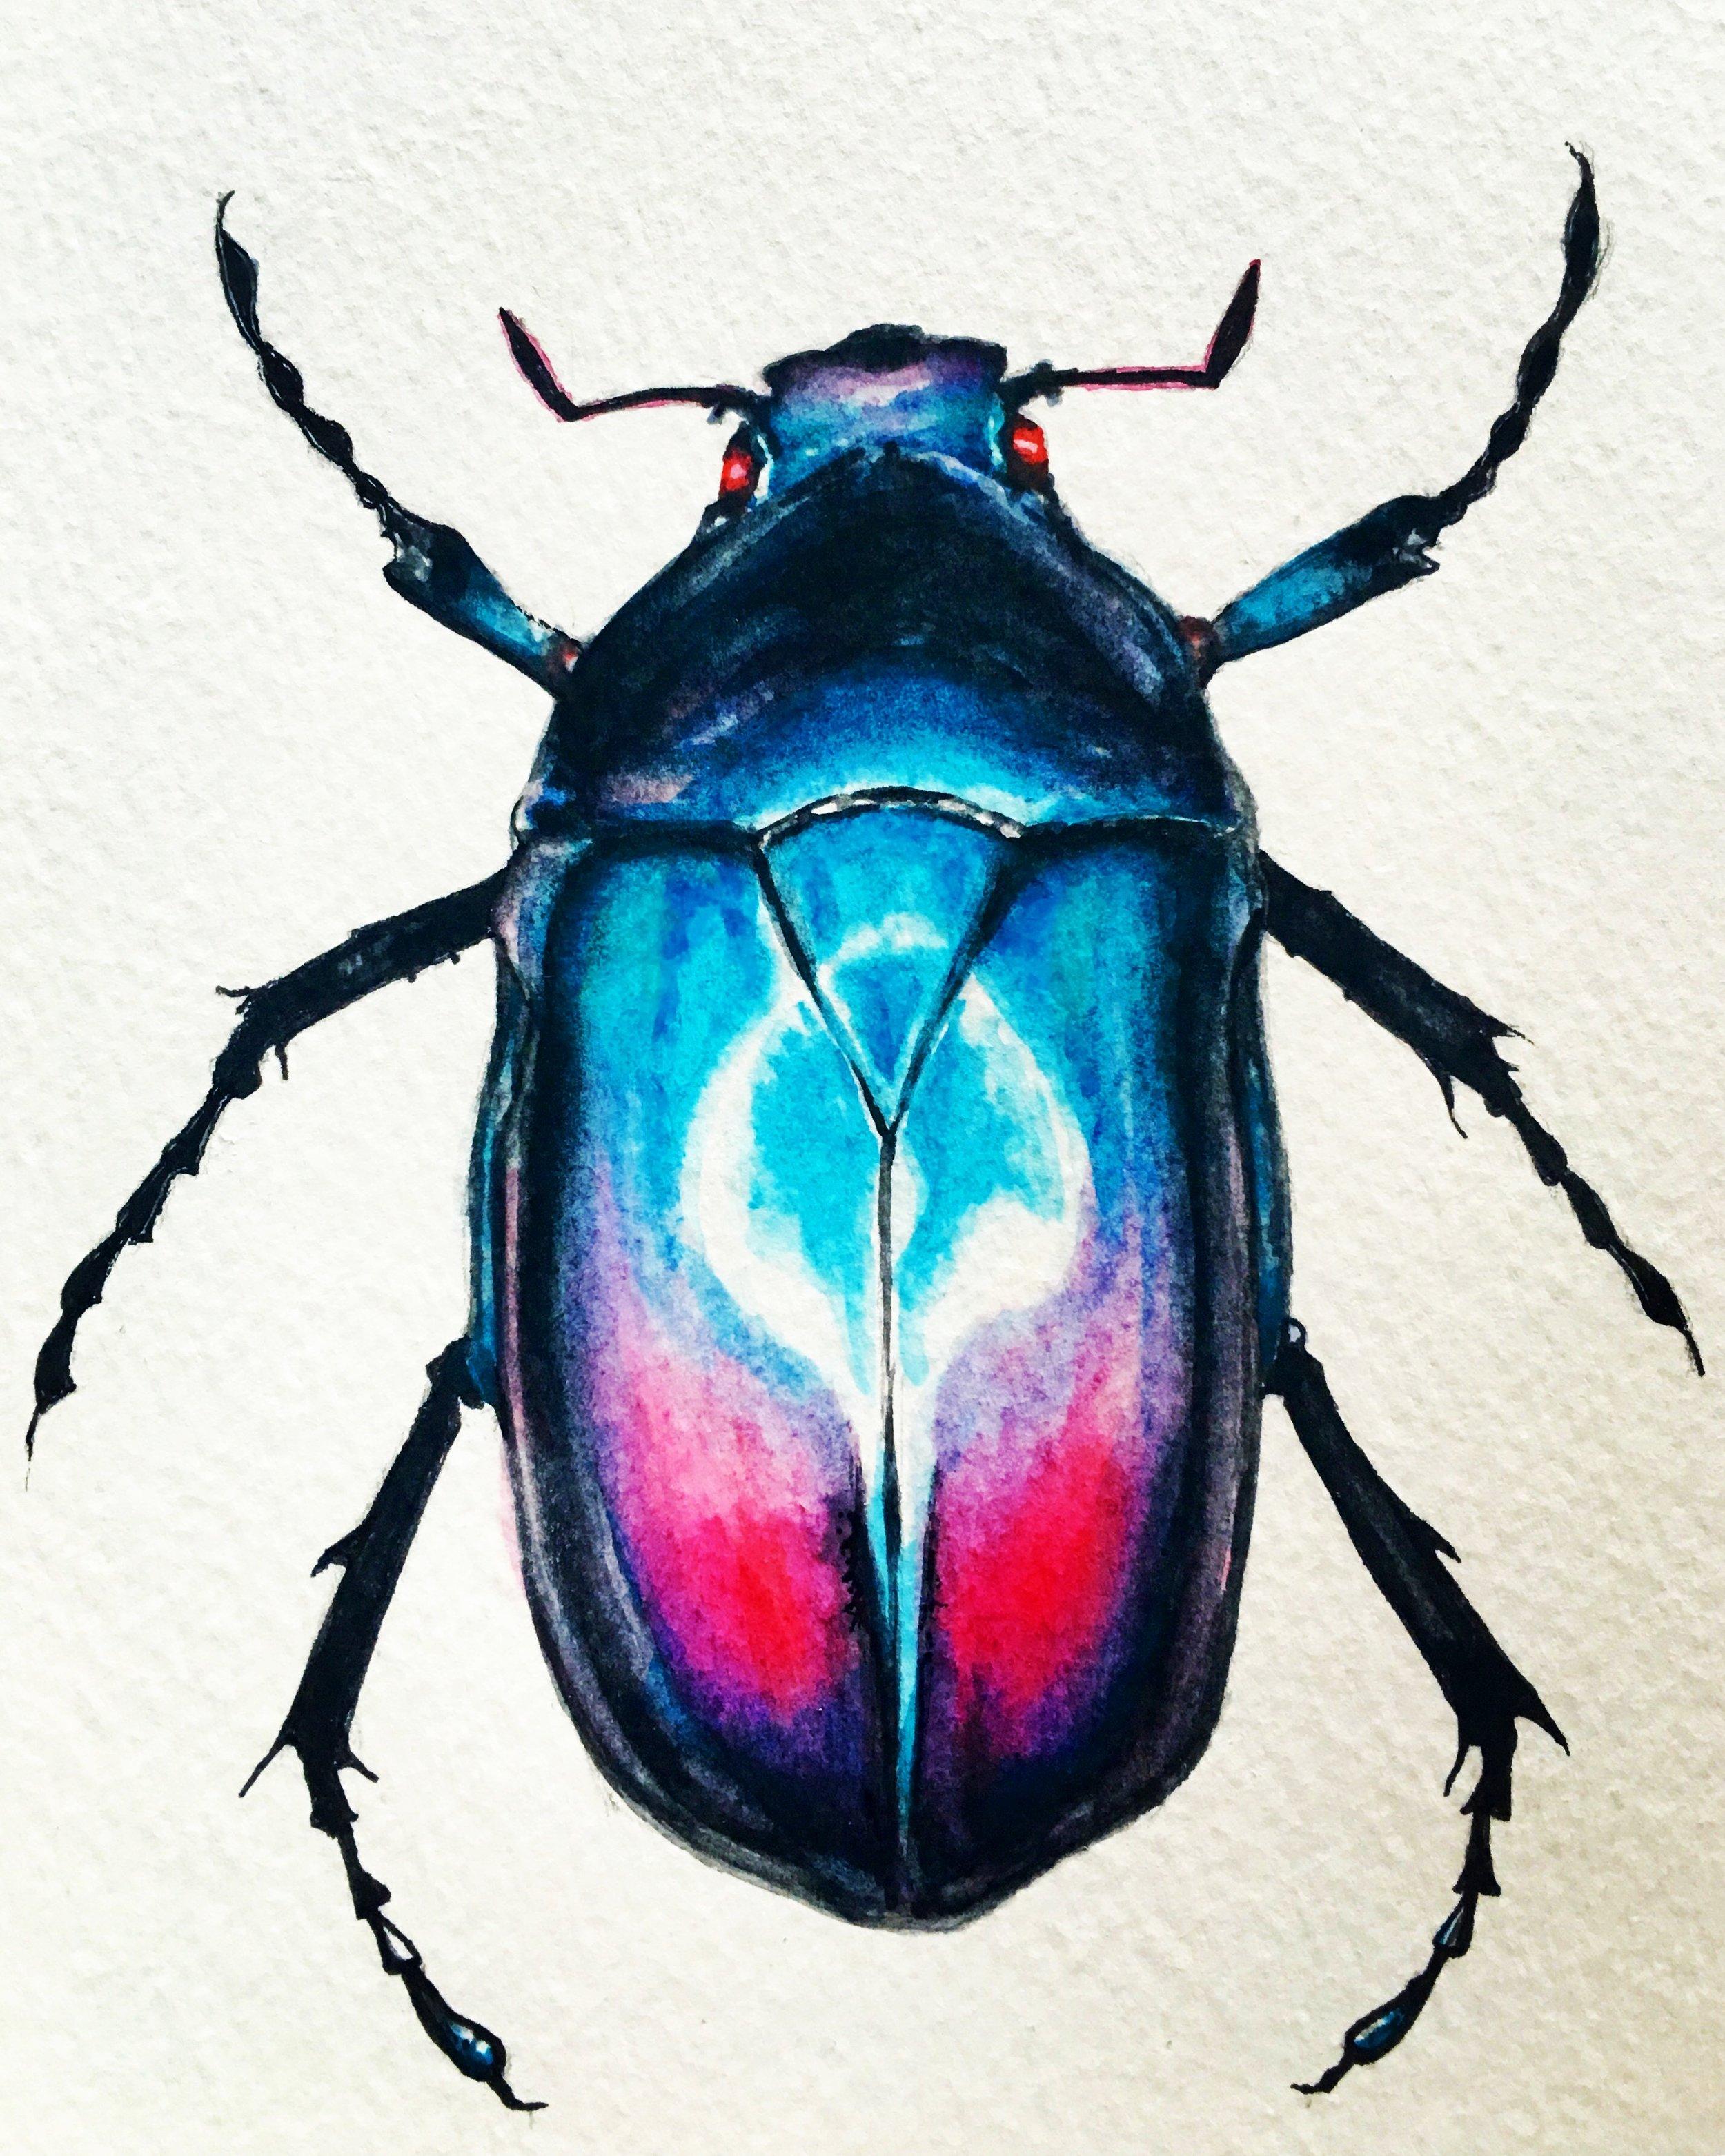 Watercolor-Beetle-Dustin-Goolsby-Art.JPG